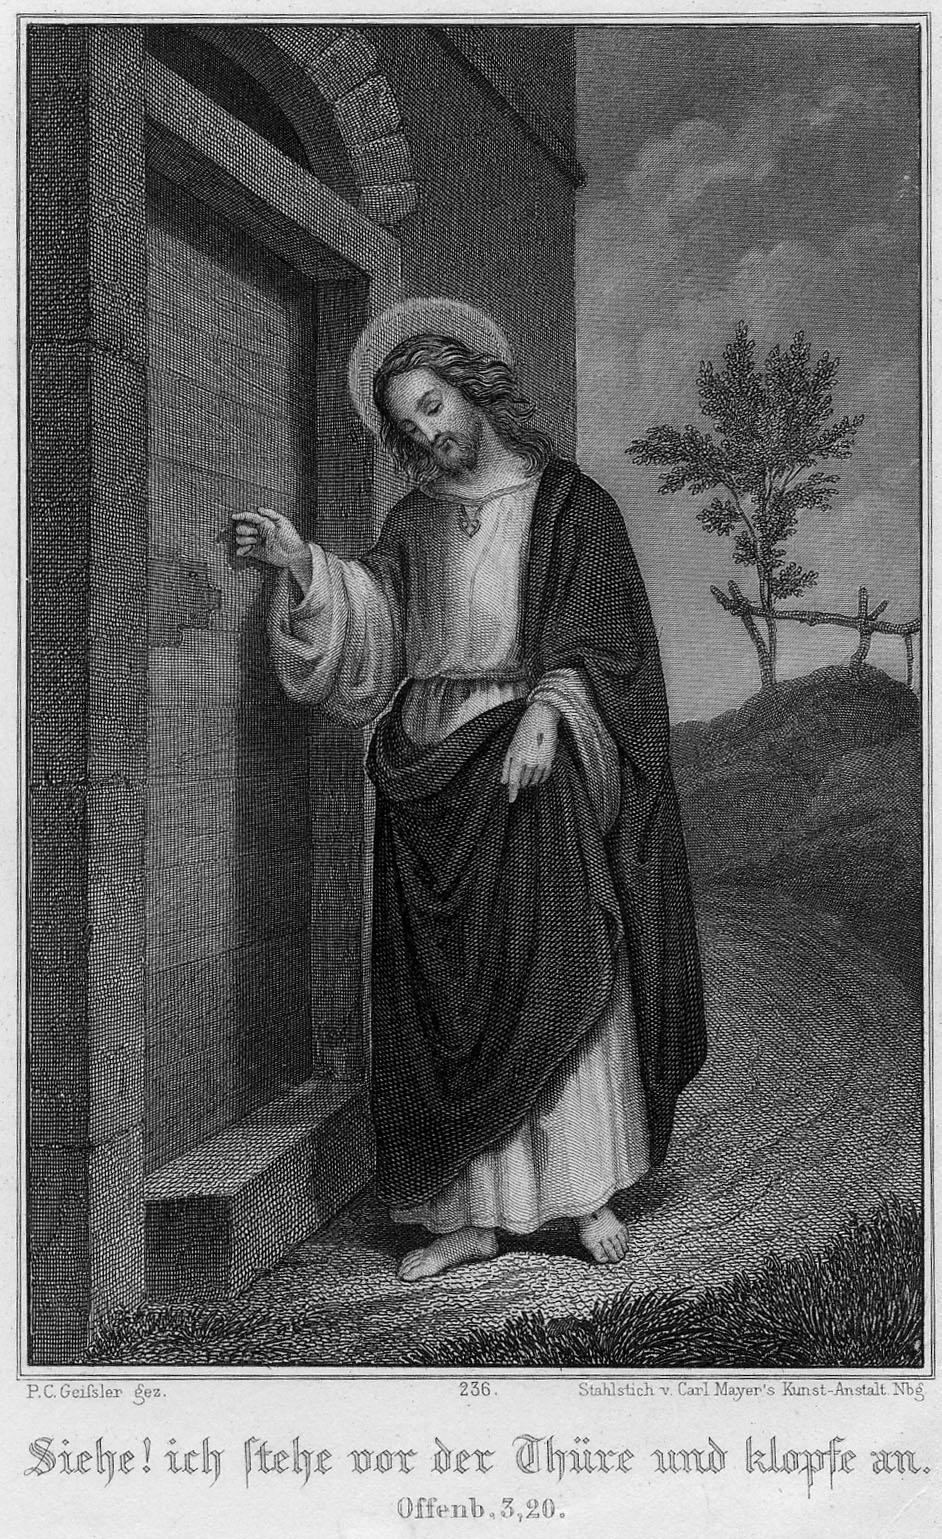 Jesus christ knocking the door and sacred heart pictures image of jesus christ altavistaventures Gallery